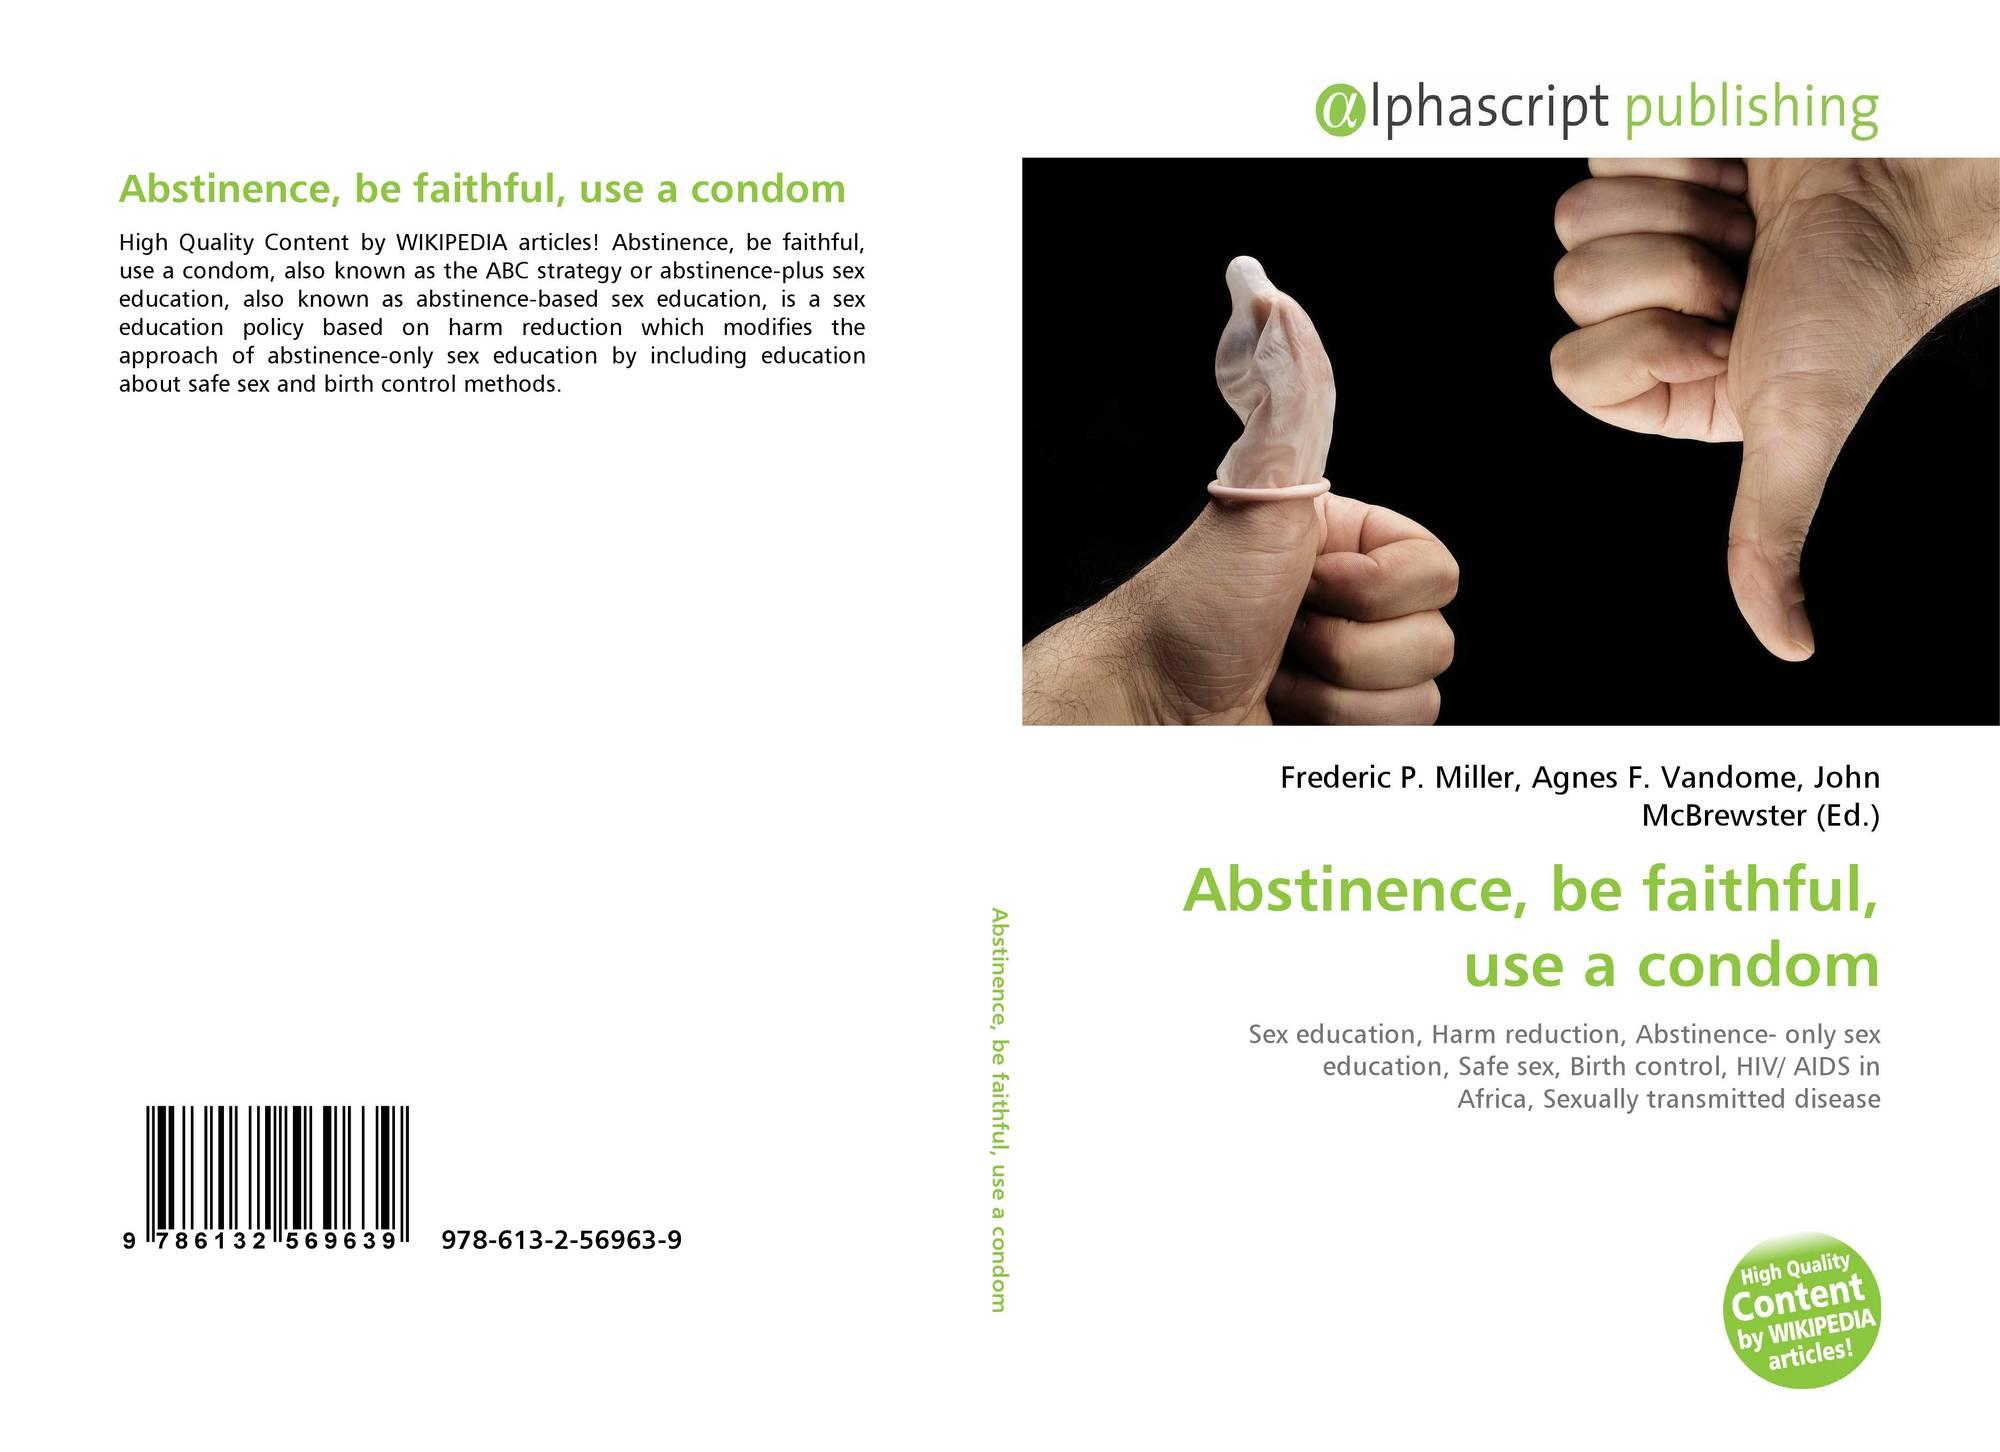 Abstanince condom galleries 50